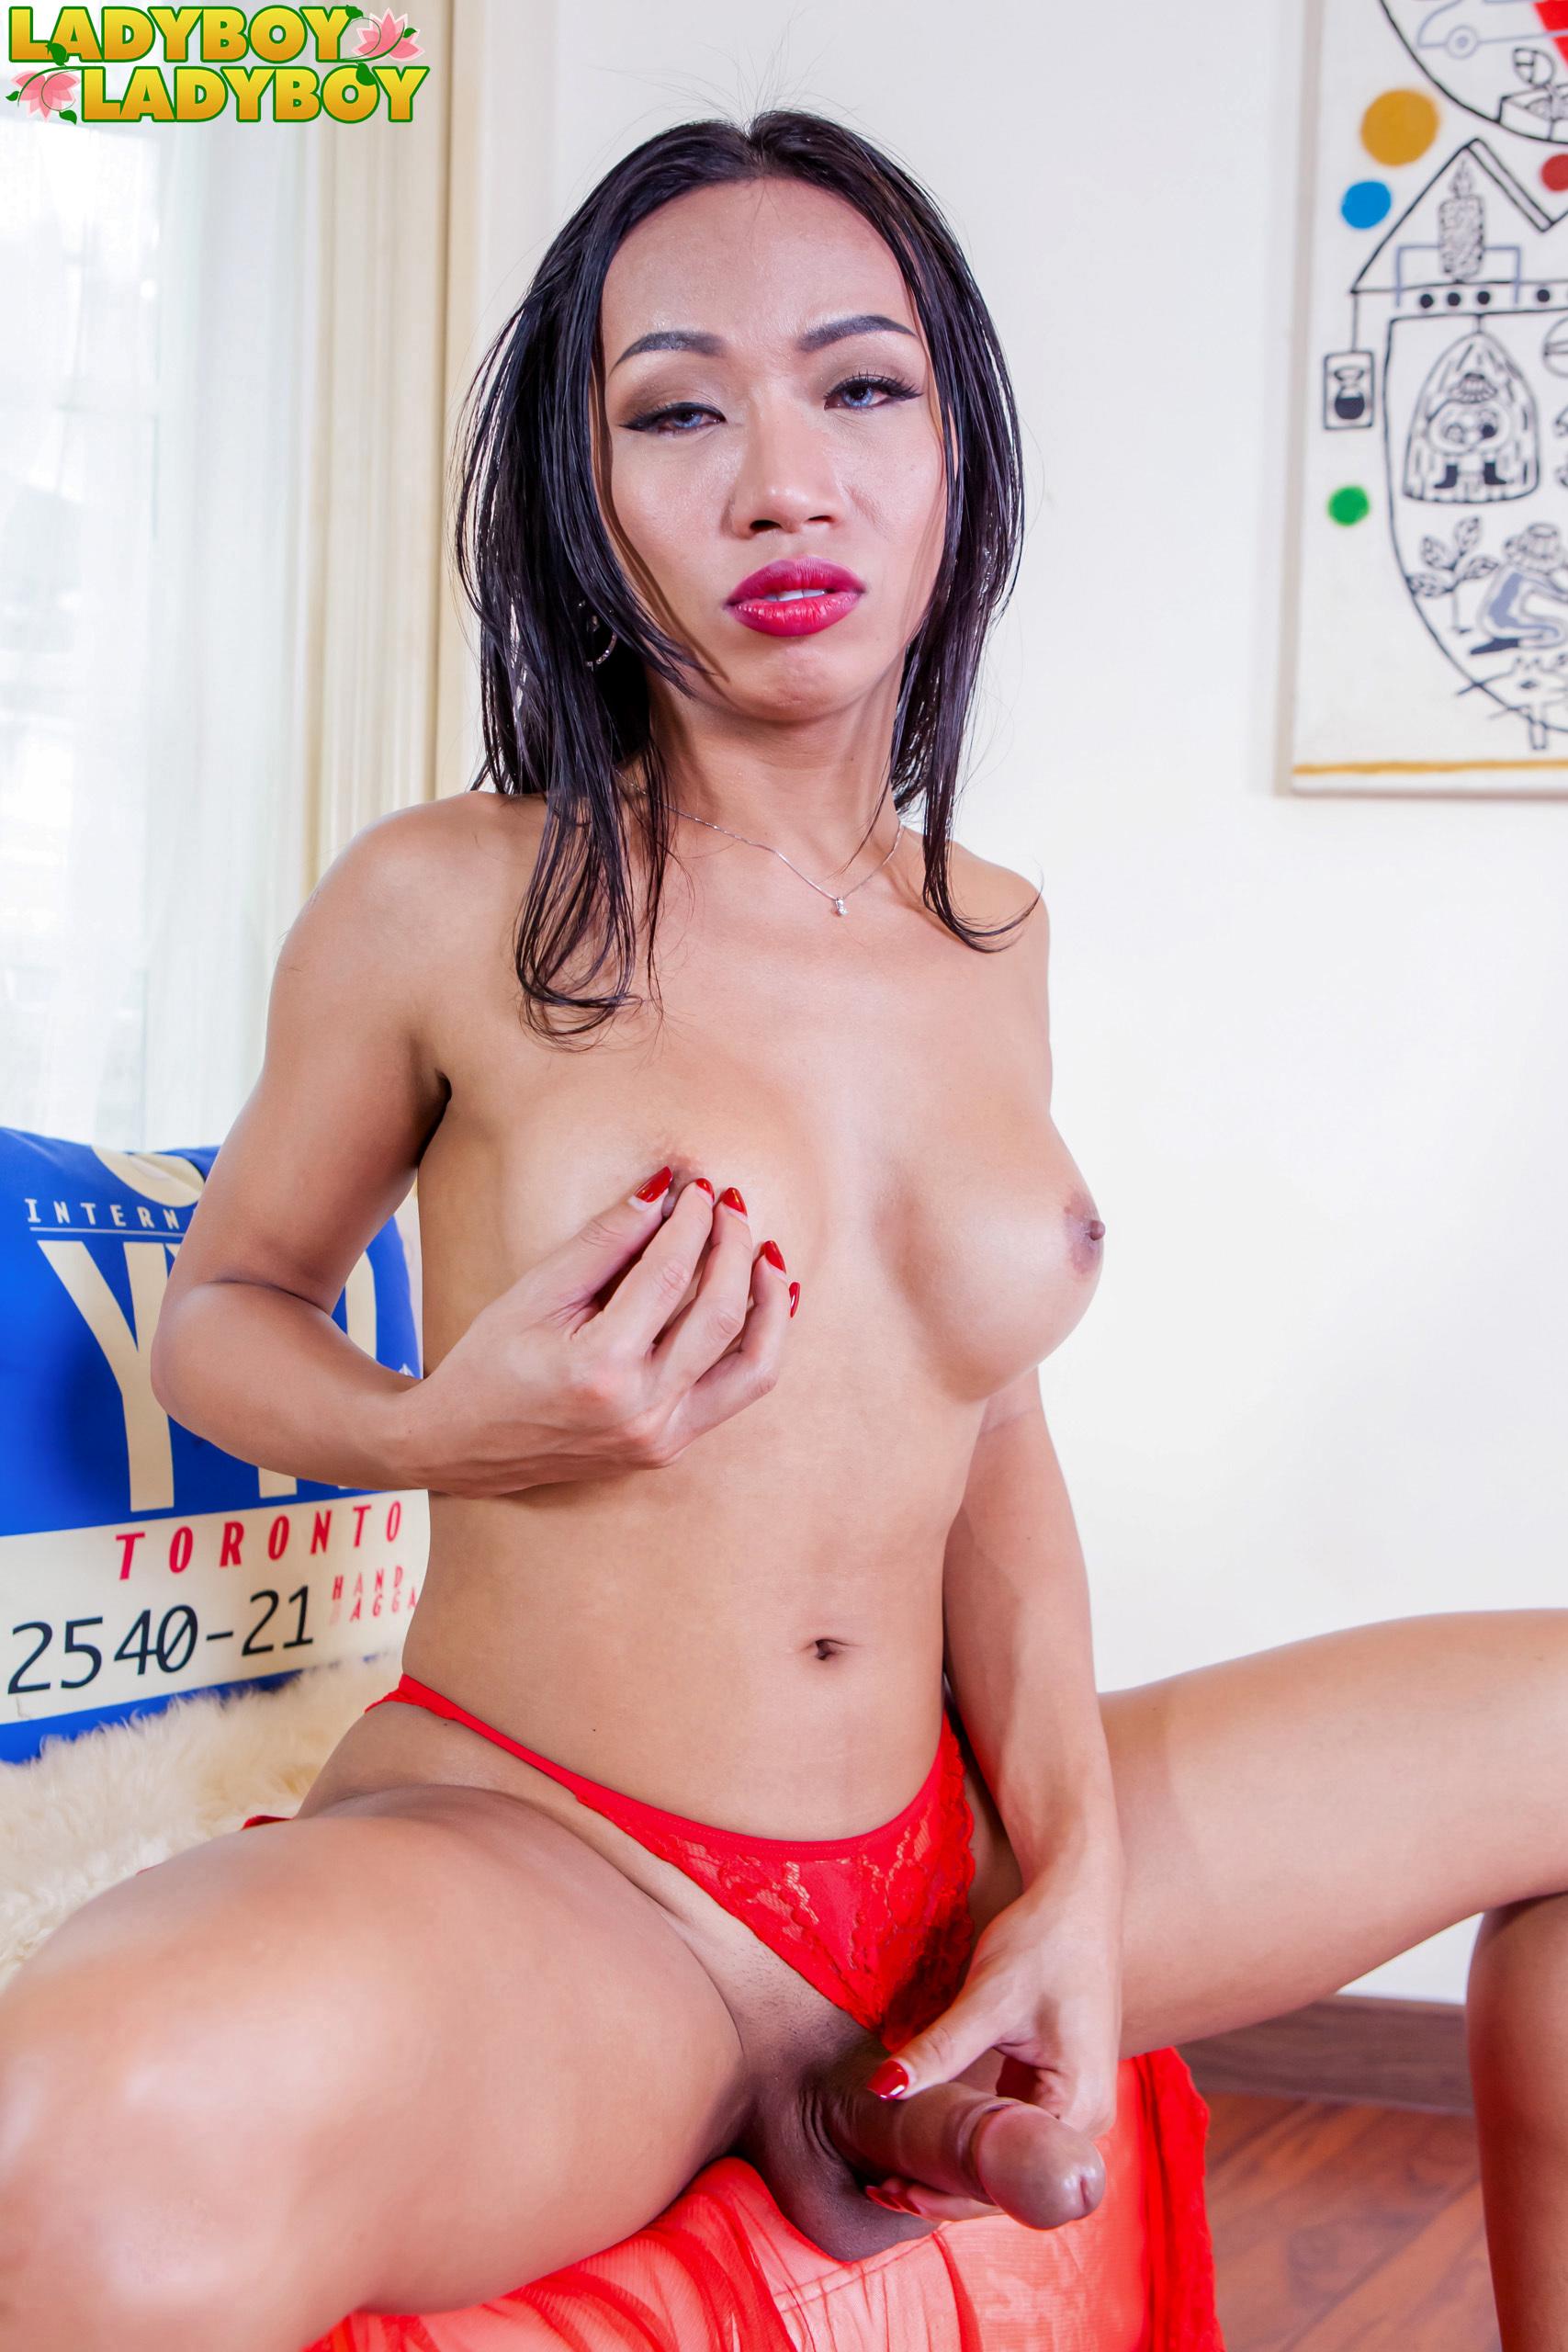 Red Suggestive Sindy Cums!